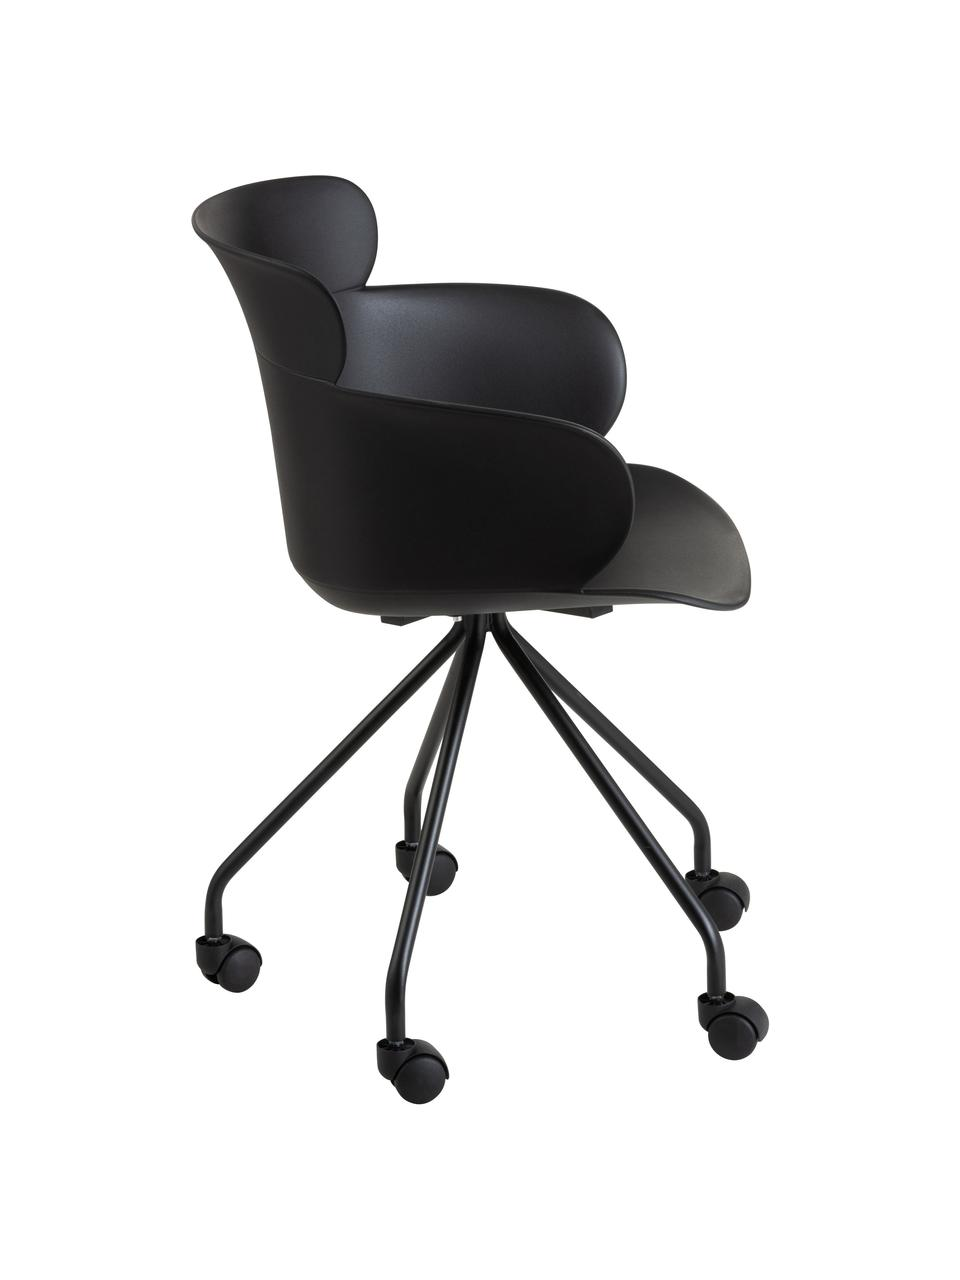 Kunststoff-Bürostuhl Eva mit Rollen, Kunststoff (PP), Schwarz, B 60 x T 54 cm